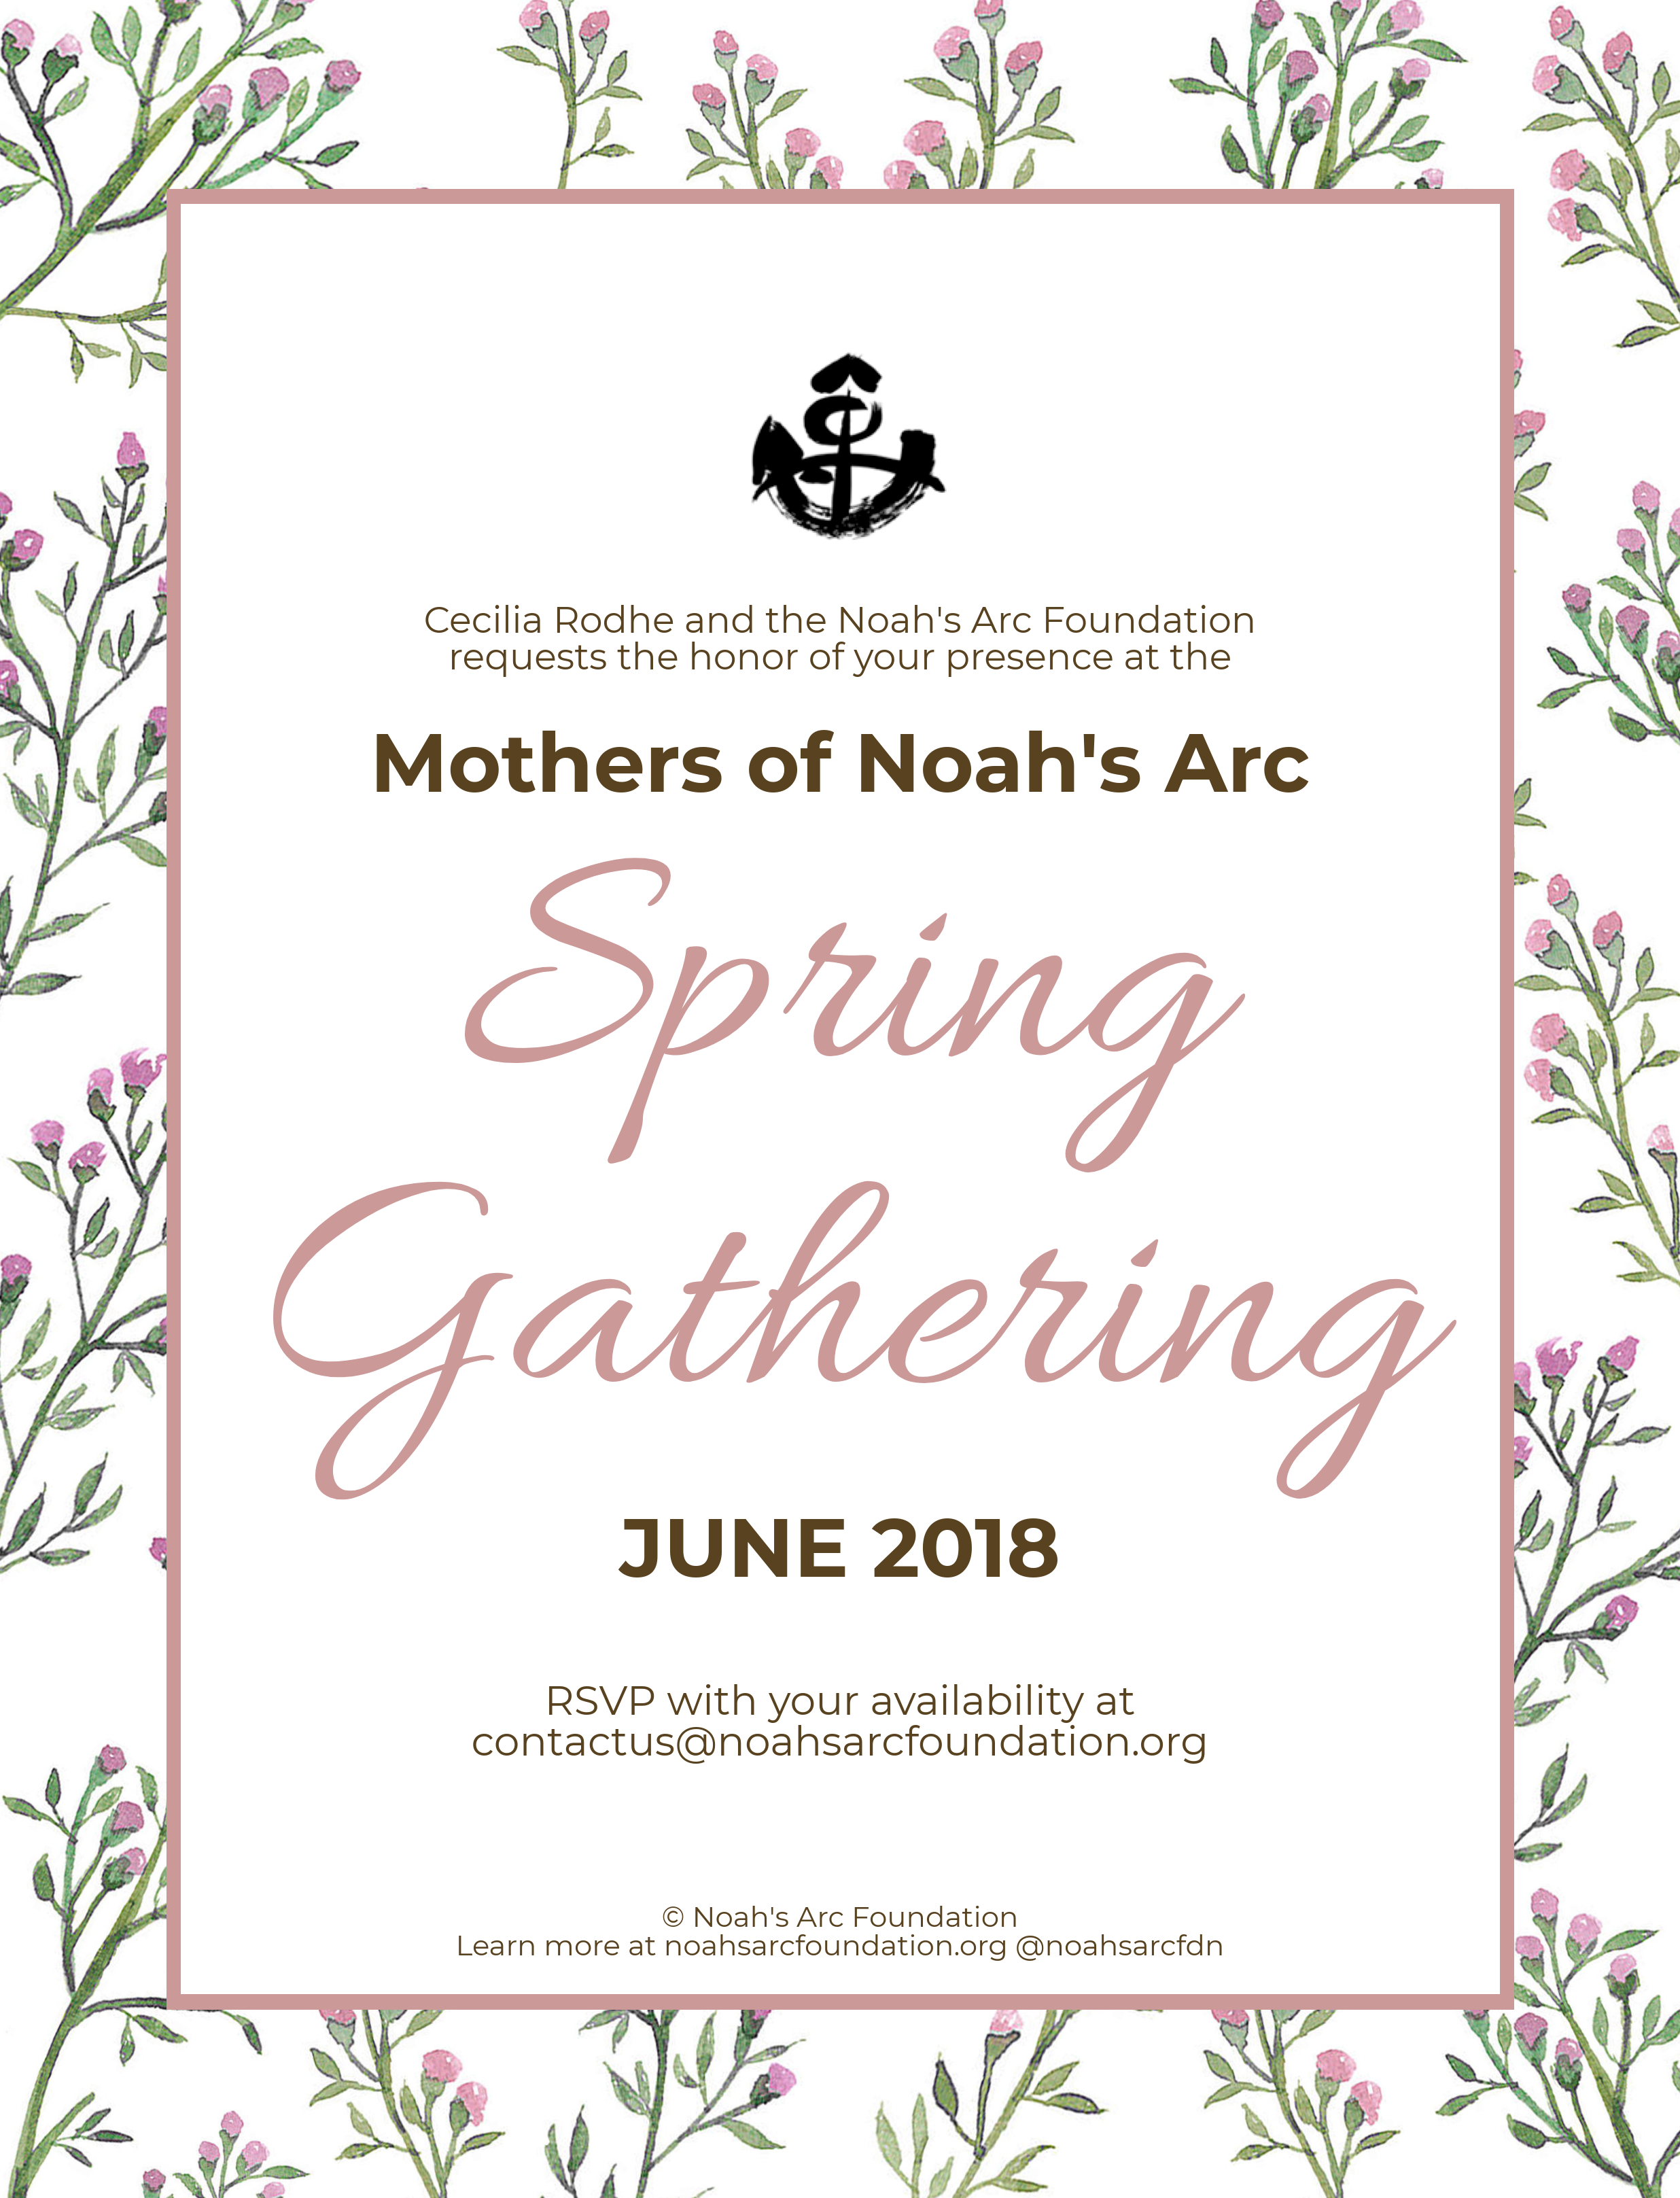 Mothers of Noah's Arc Spring Gathering Invitation